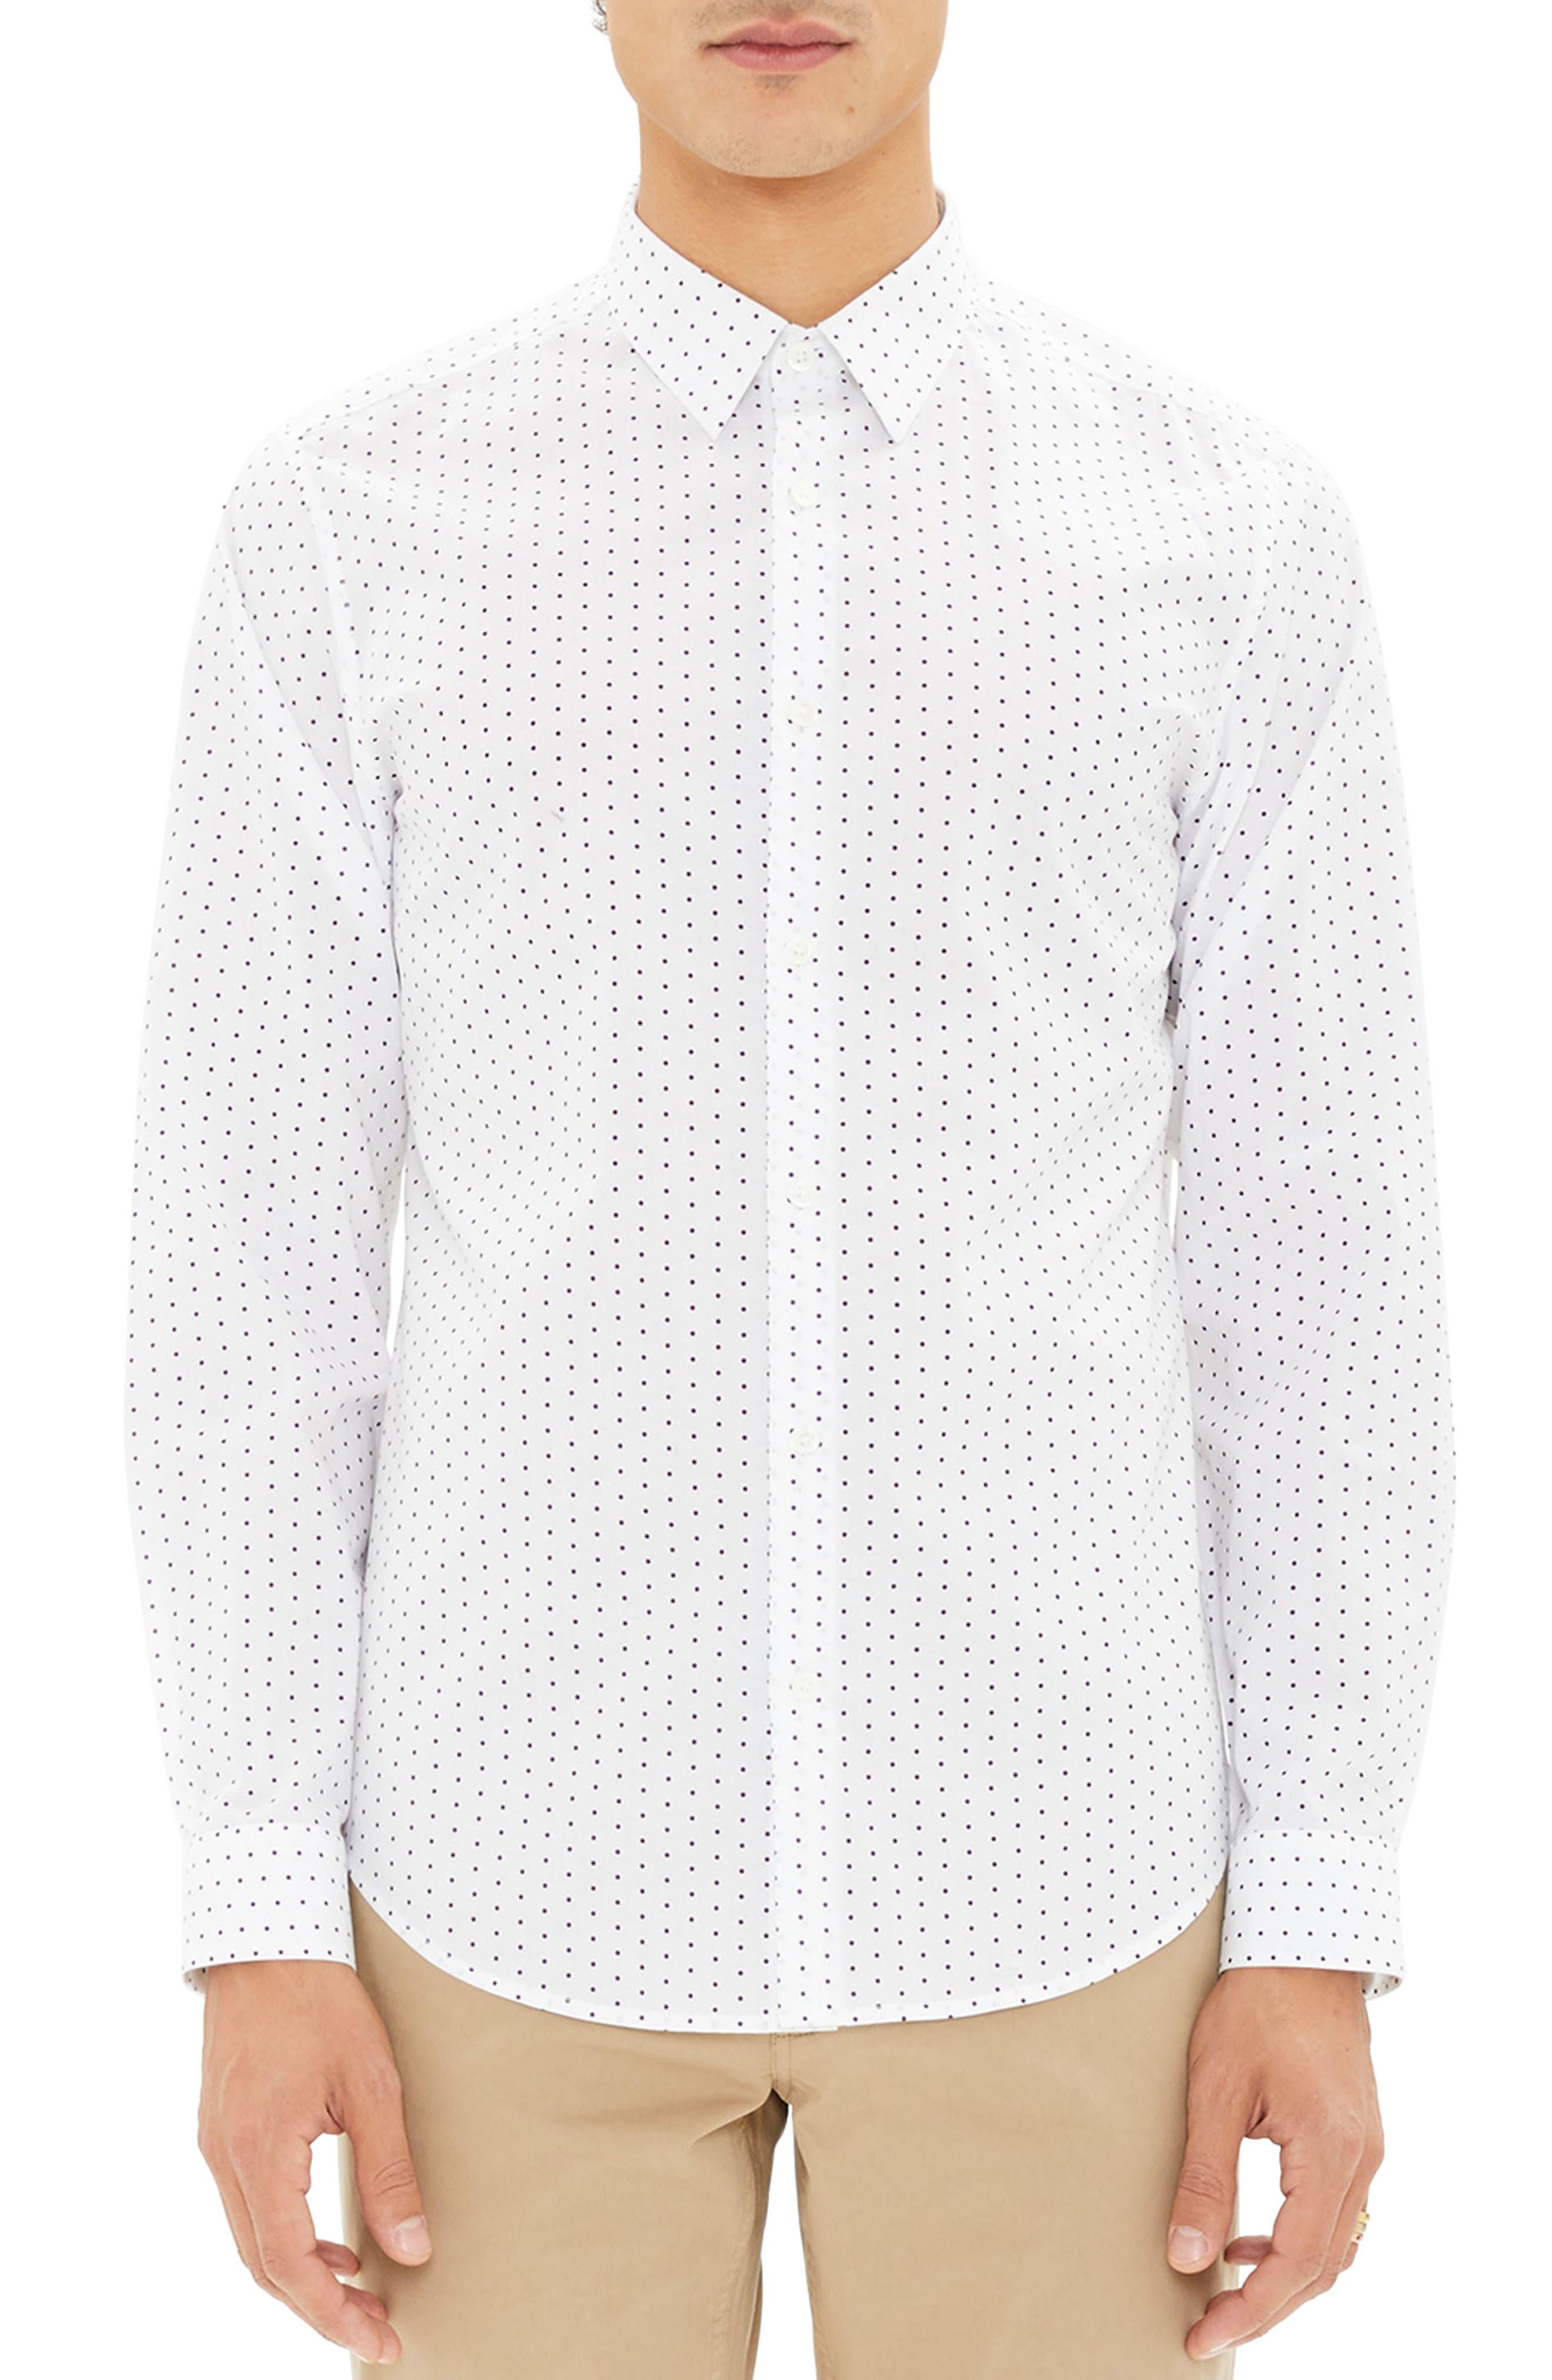 Irving Trim Fit Polka Dot Sport Shirt,                             Main thumbnail 1, color,                             110